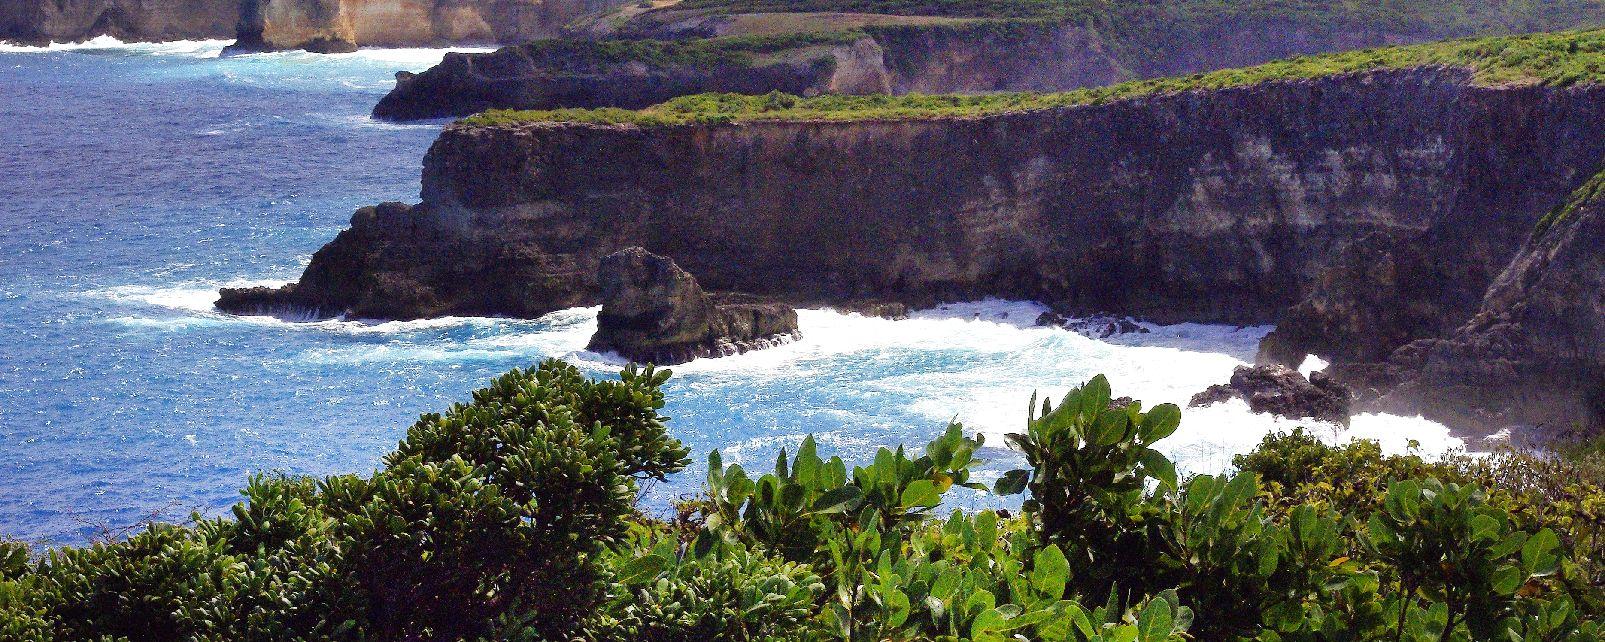 Caravelle Beach , Pointe de la Grande Vigie , The islands of Guadeloupe